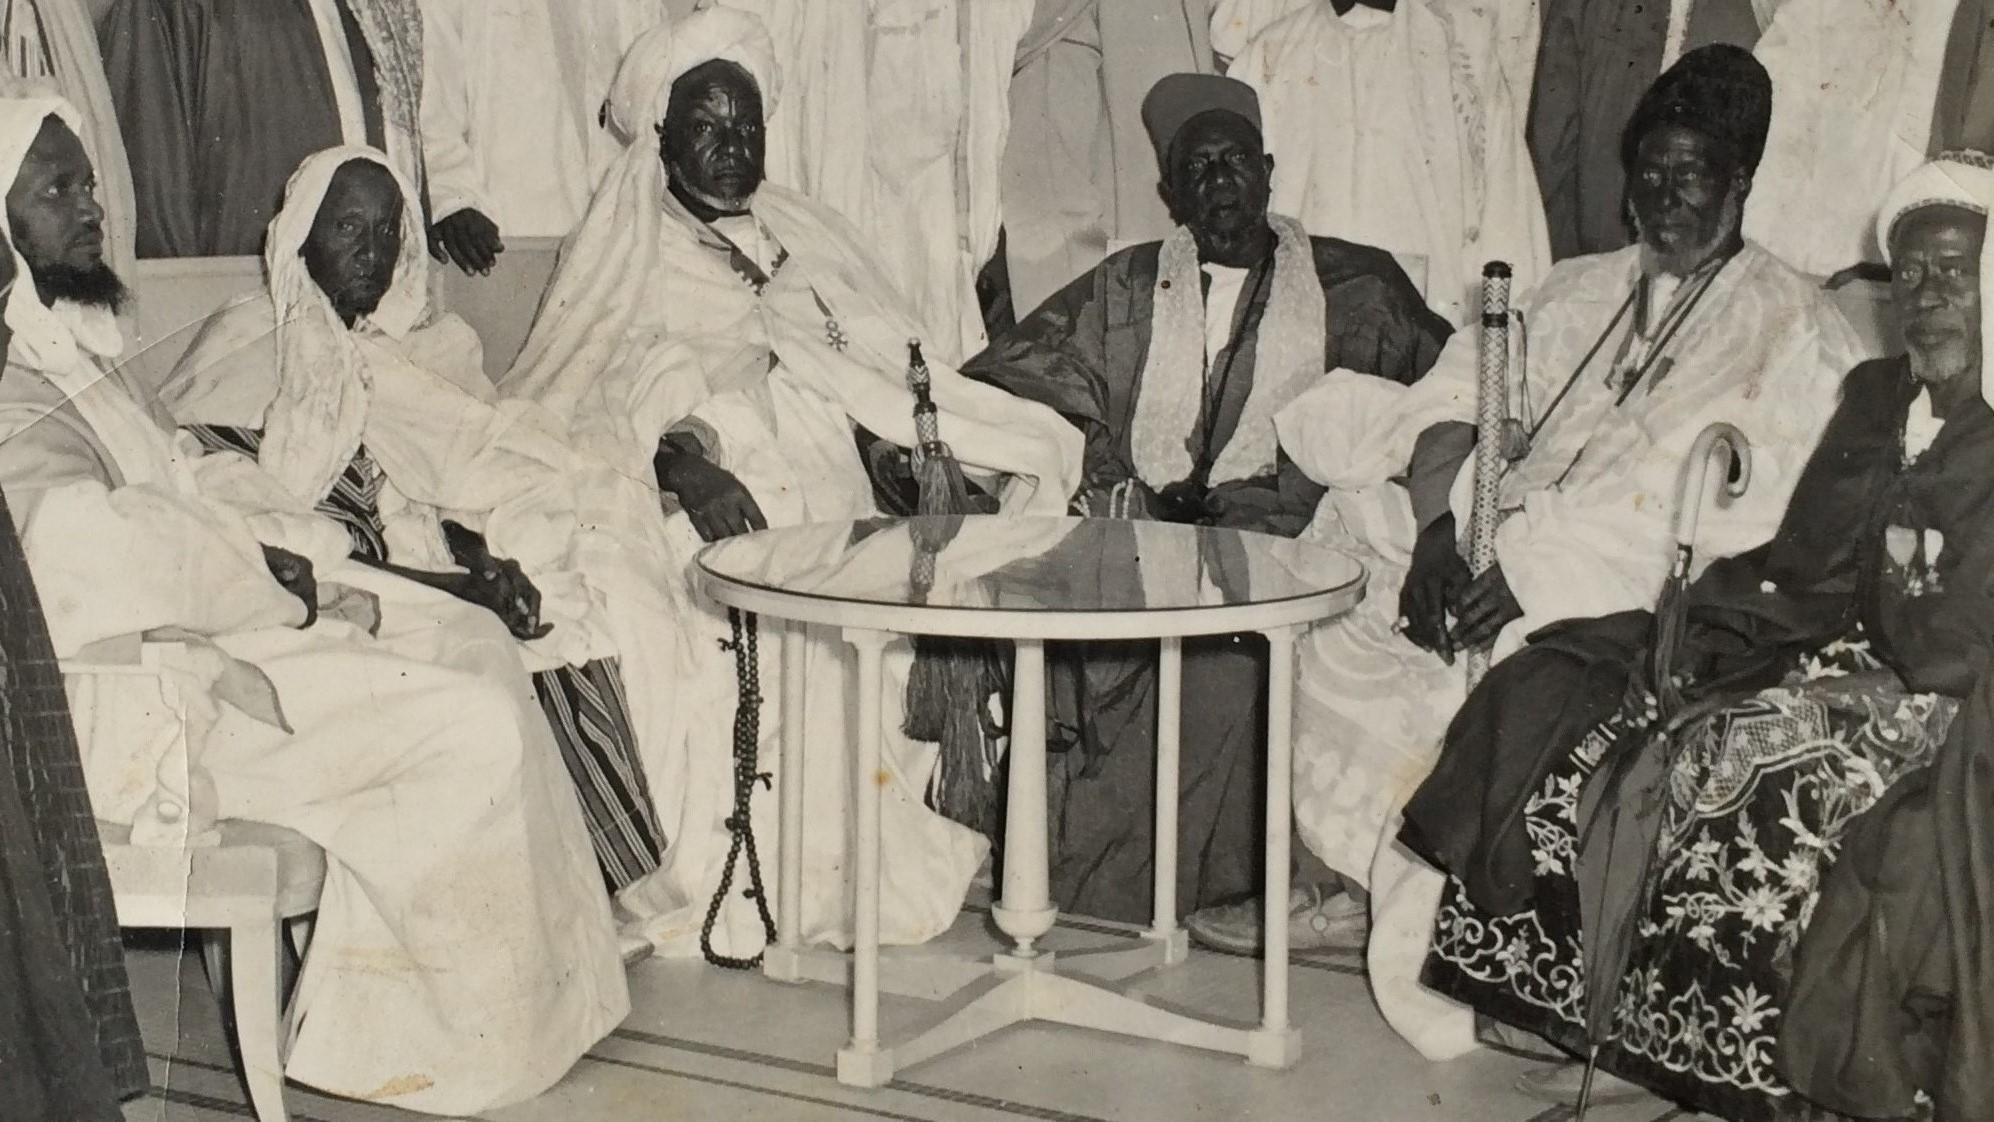 De droite à gauche Mousse Diop (Serigne Ndakarou), Alieu Coudou Ndoye (Jaraf),  Mbor Diagne (Ndeye Dji Reew), Ibrahima Diop (Serigne Ndakarou), Babacar Thiaw Laye, Amadou Lamine Diene (Imam Ratib)